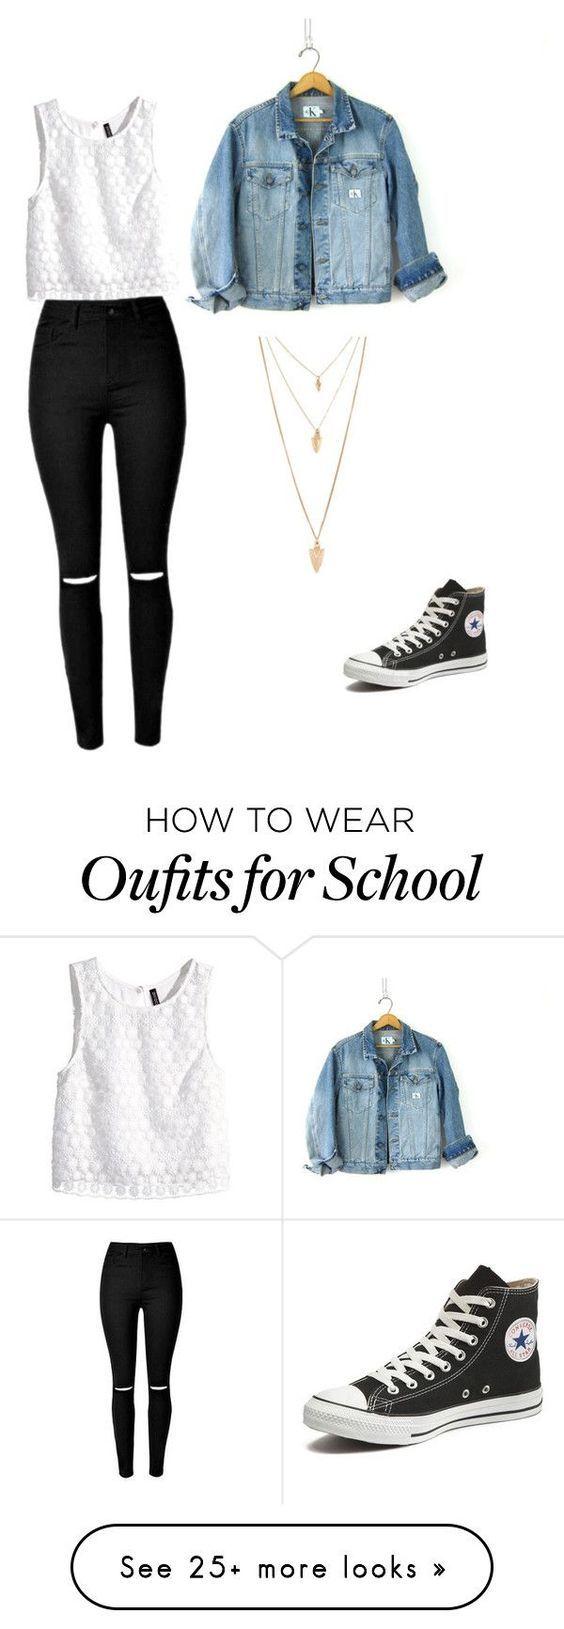 Outfit casual, jeans negros rotos, blusa blanca sin mangas, chamarra de mezclilla, converse negros de bota.